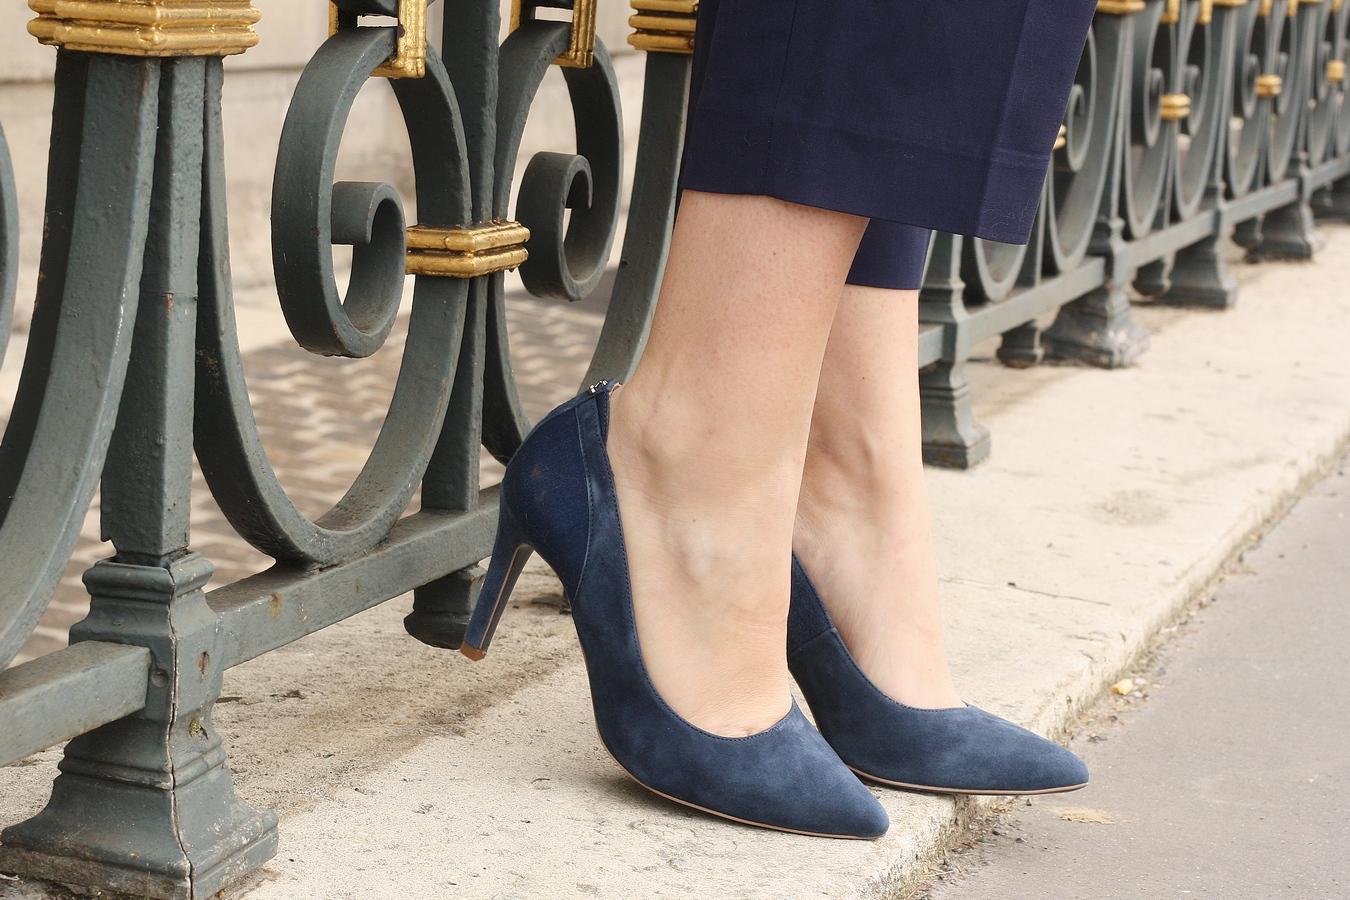 Blog mode femme Paris - Du style, Madame - Streetstyle - escarpins bleu salsa